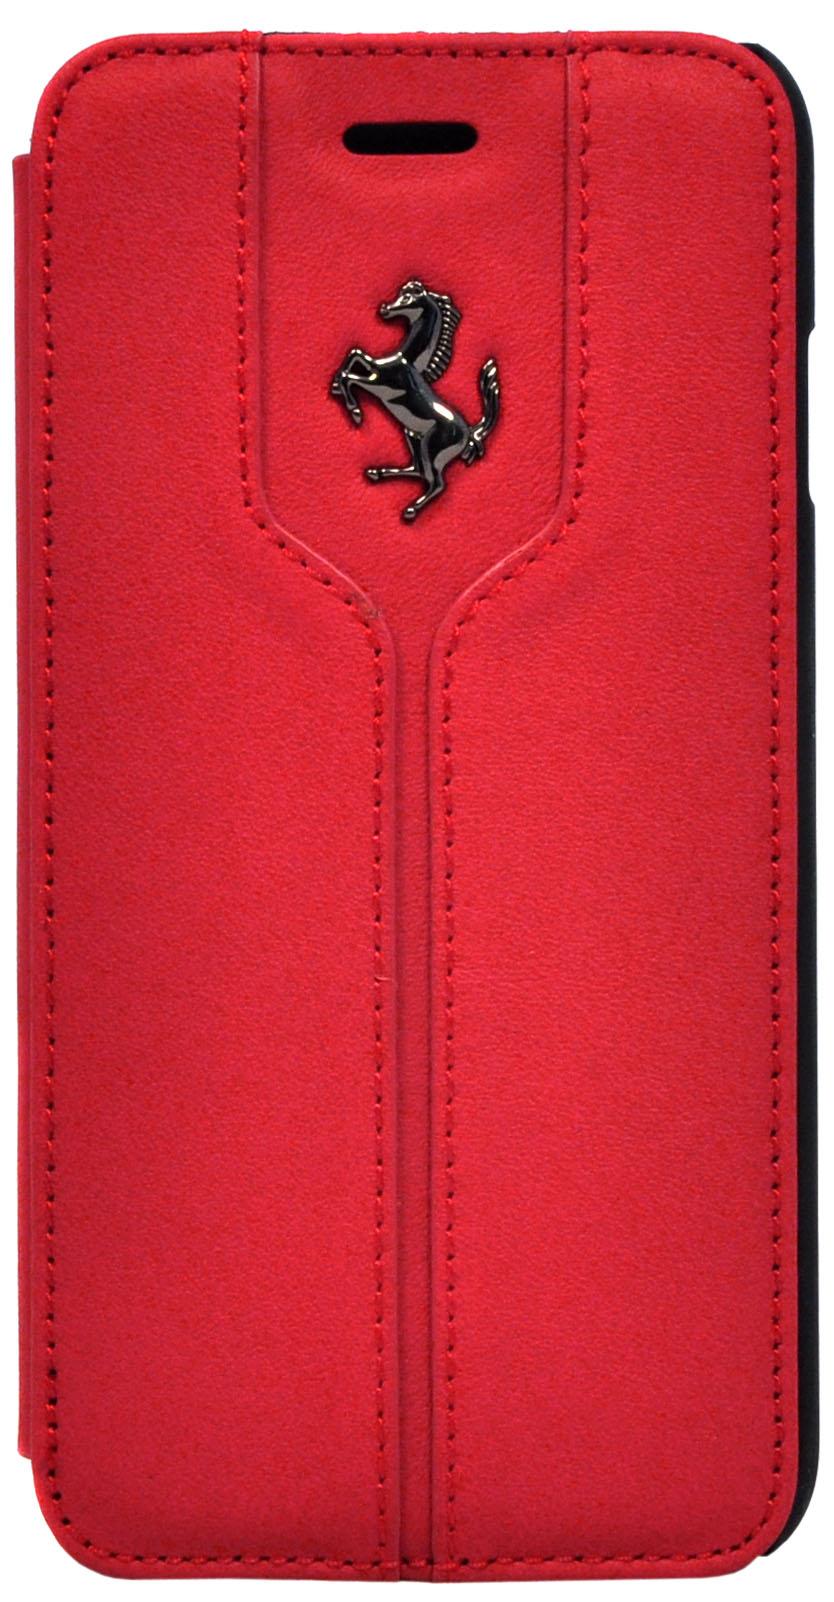 Чехол флип-кейс Ferrari Flip Montecarlo Booktype Case Red для Apple iPhone 5/5S/SE  (красный)